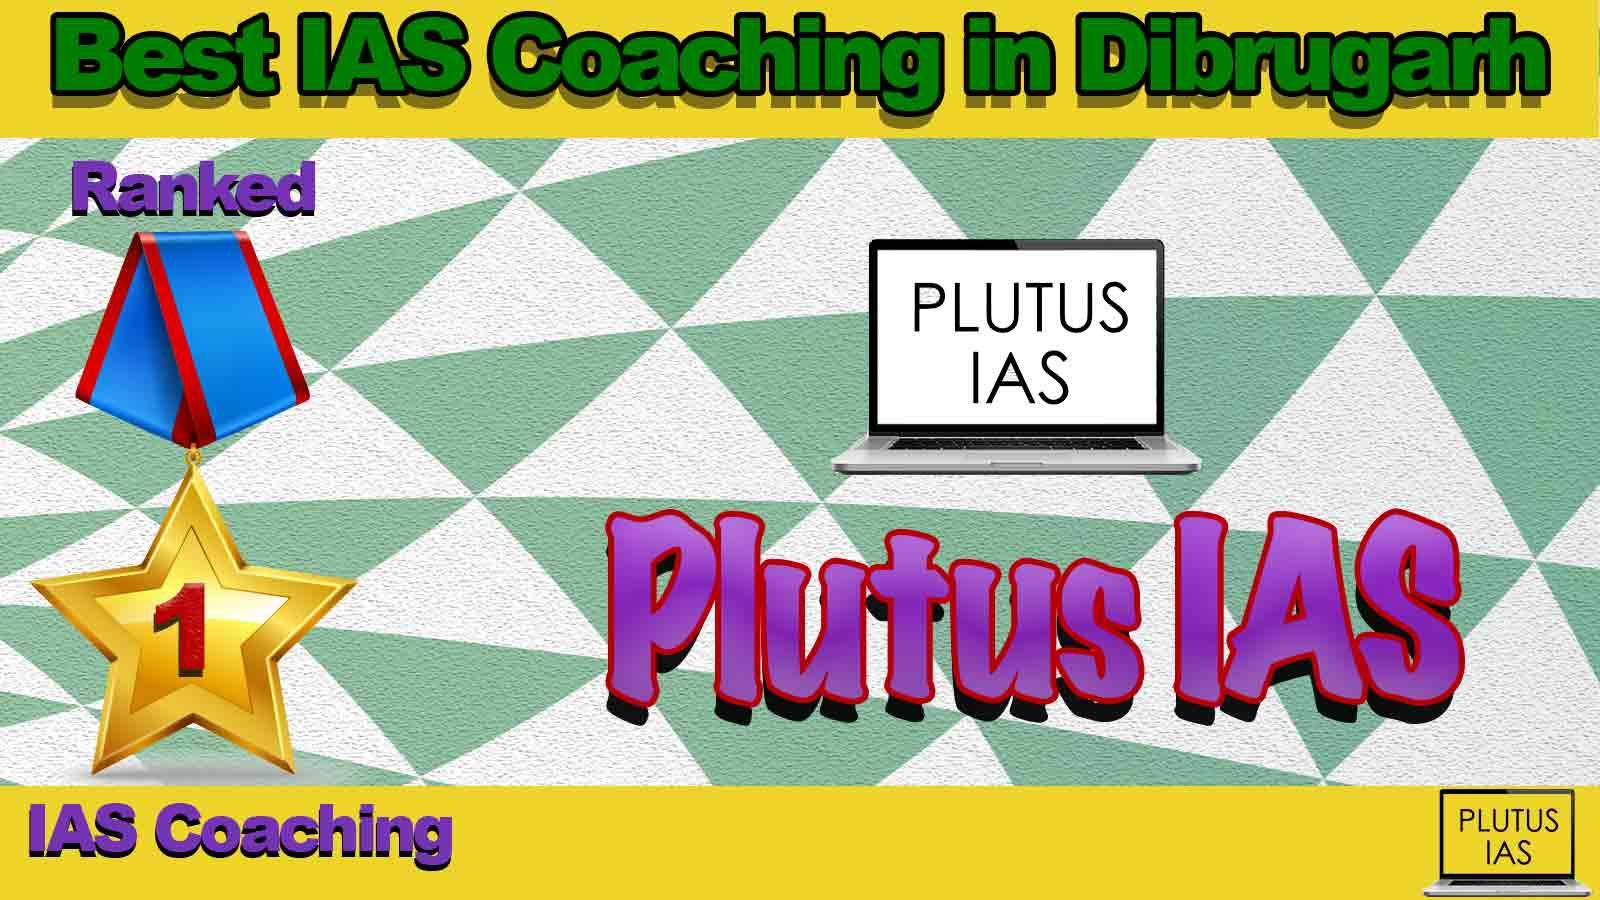 Best IAS Coaching in Dibrugarh